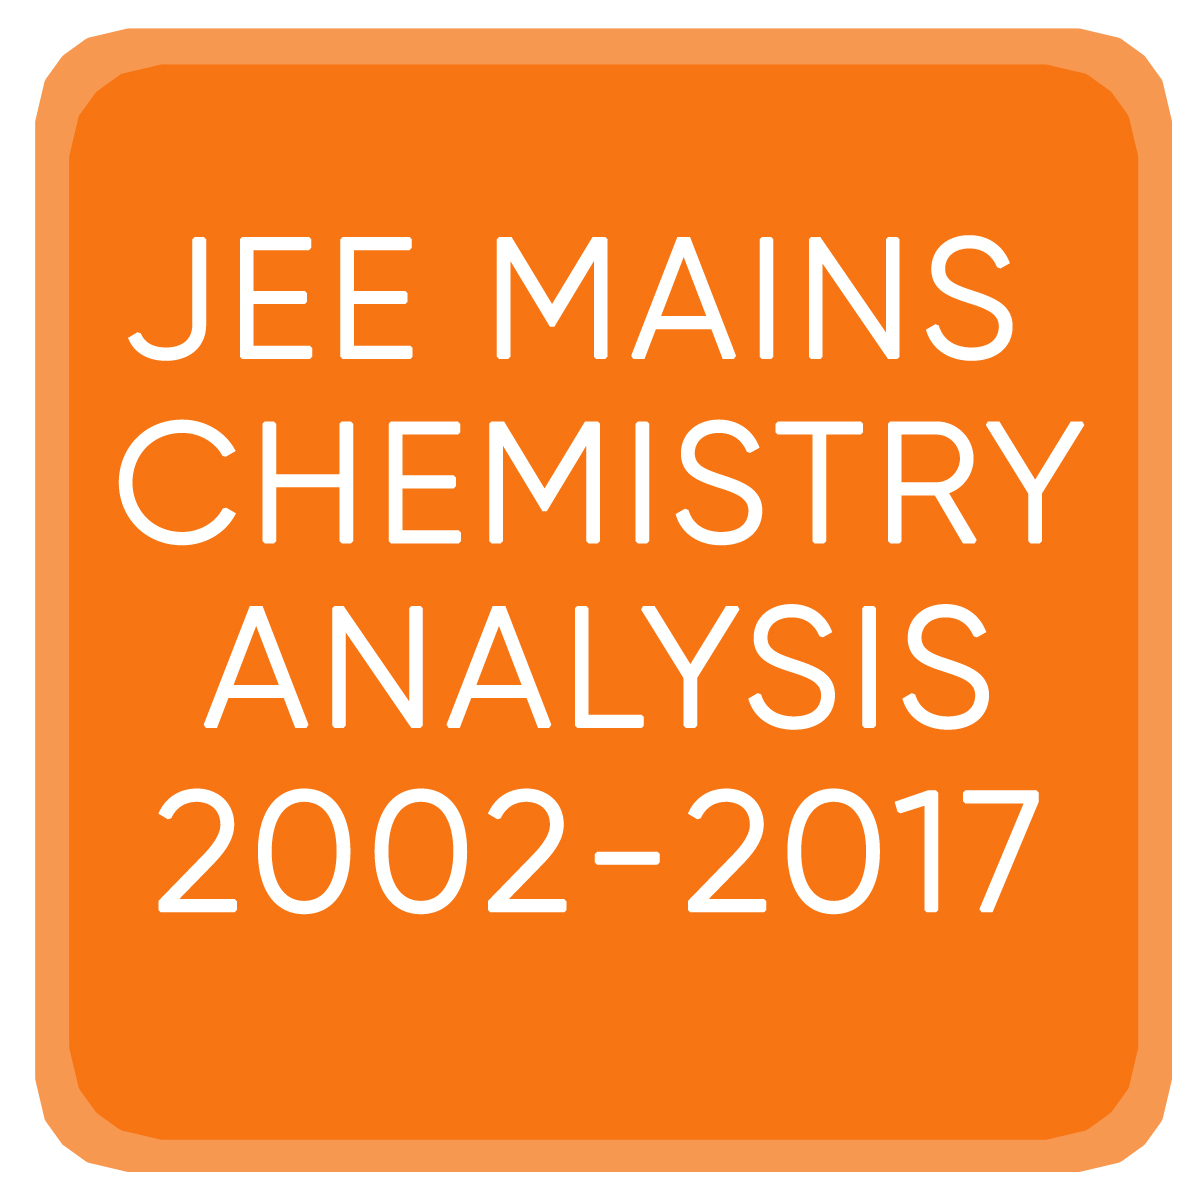 JEE MAINS CHEMISTRY ANALYSIS 2002-2017